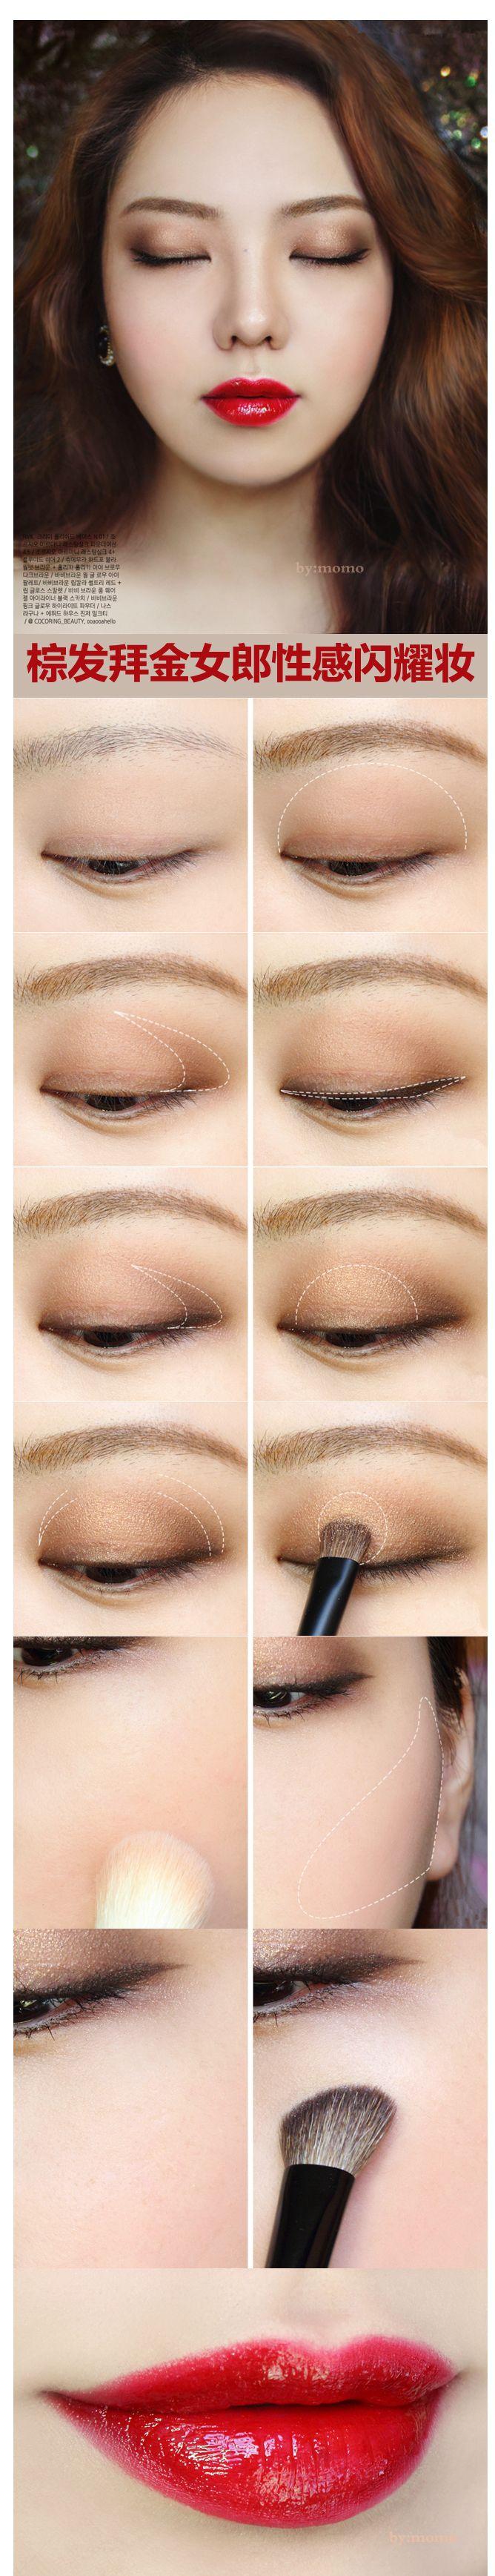 #ClassyLadyEntrepreneur asian makeup tutorial ✨www.SkincareInKorea.info ✨www...